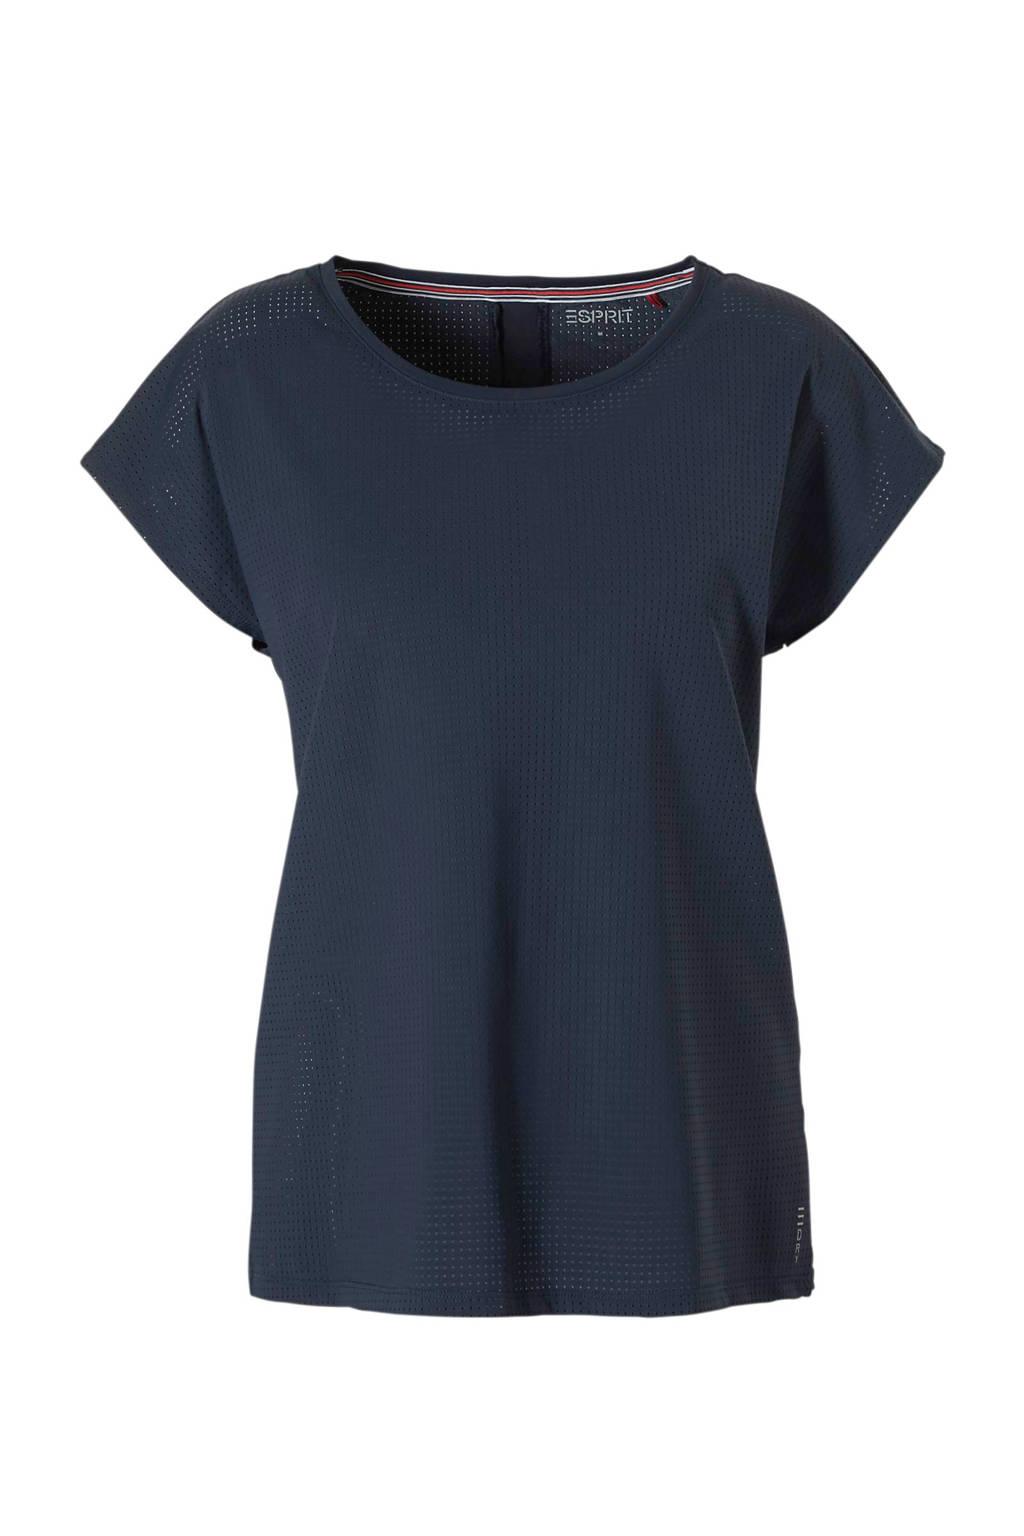 ESPRIT Women Sports sport T-shirt donkerblauw, Donkerblauw